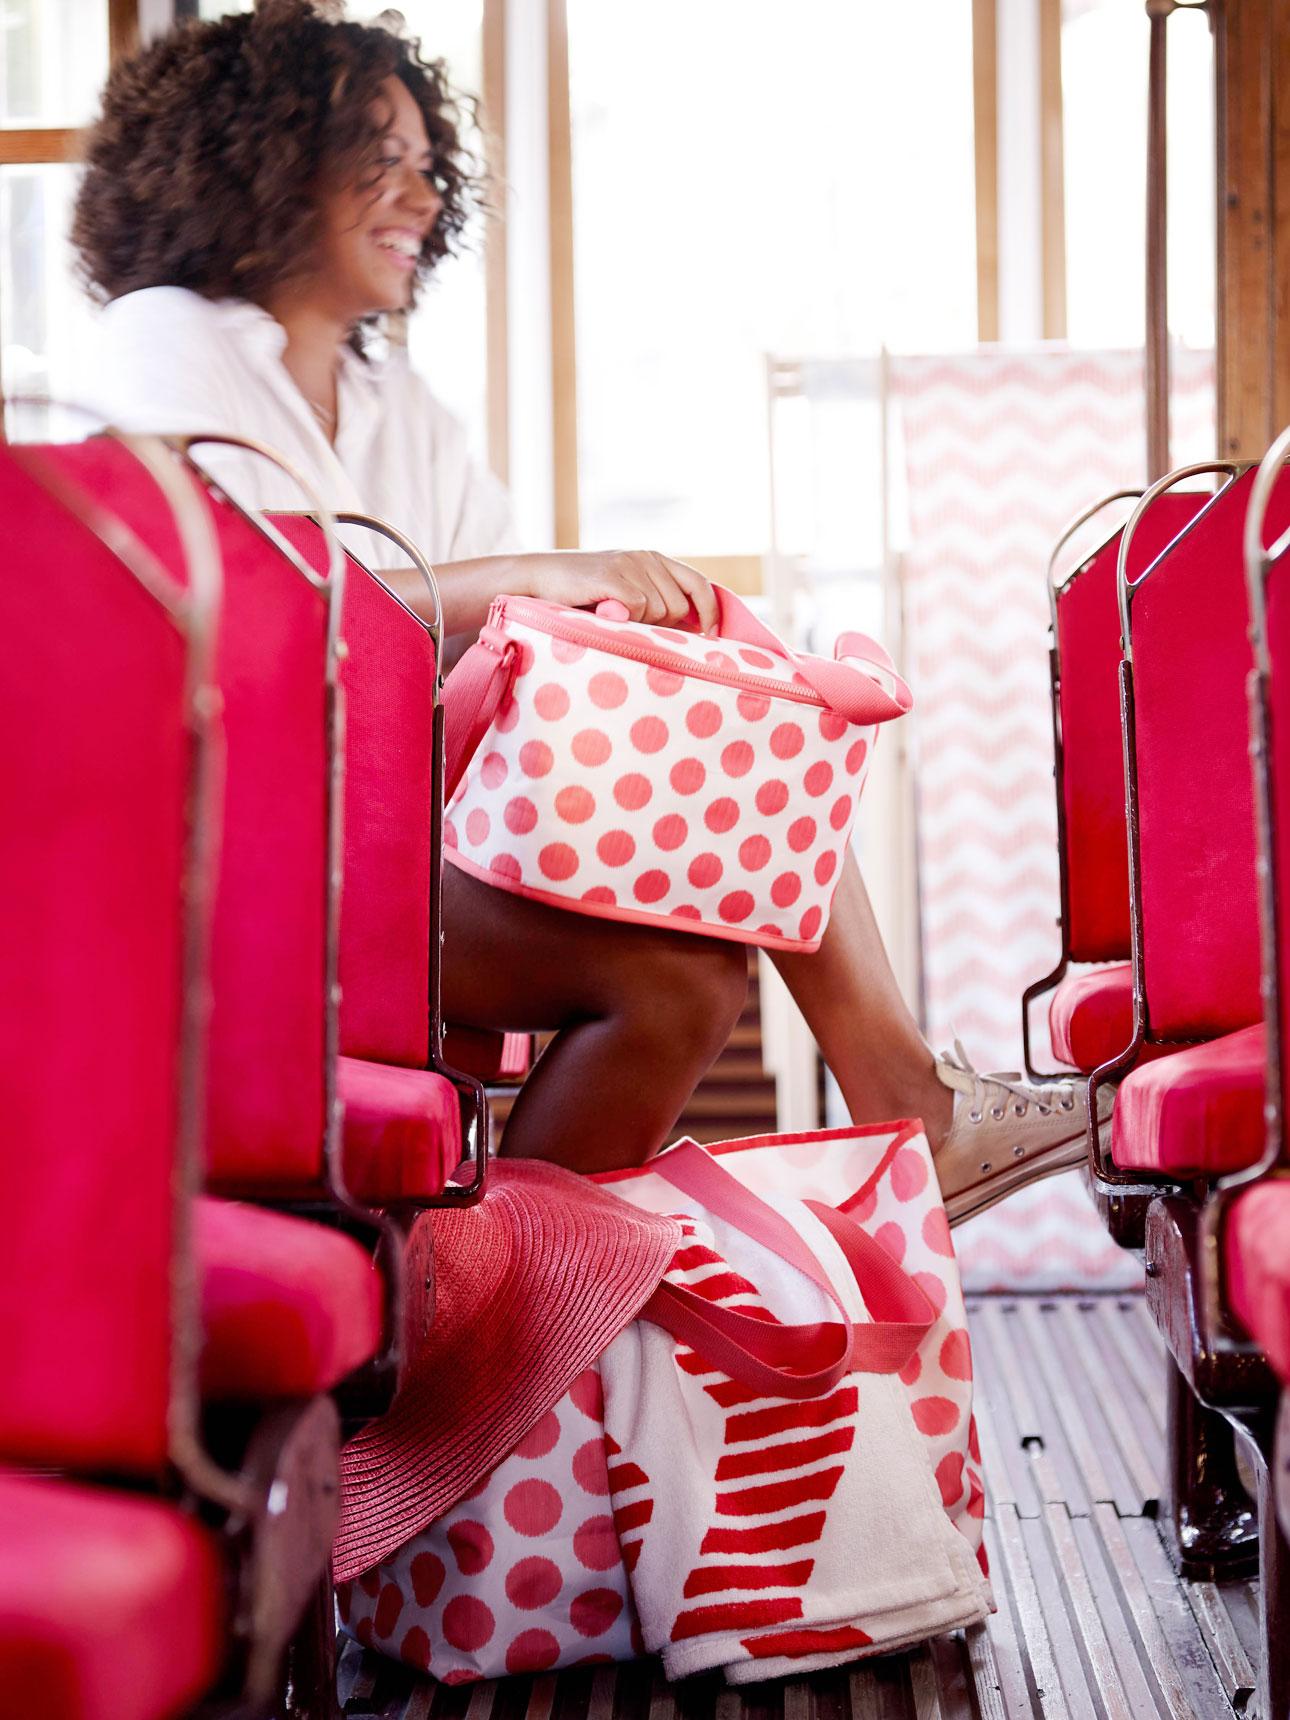 Ikea Sommar 2016 bus rood